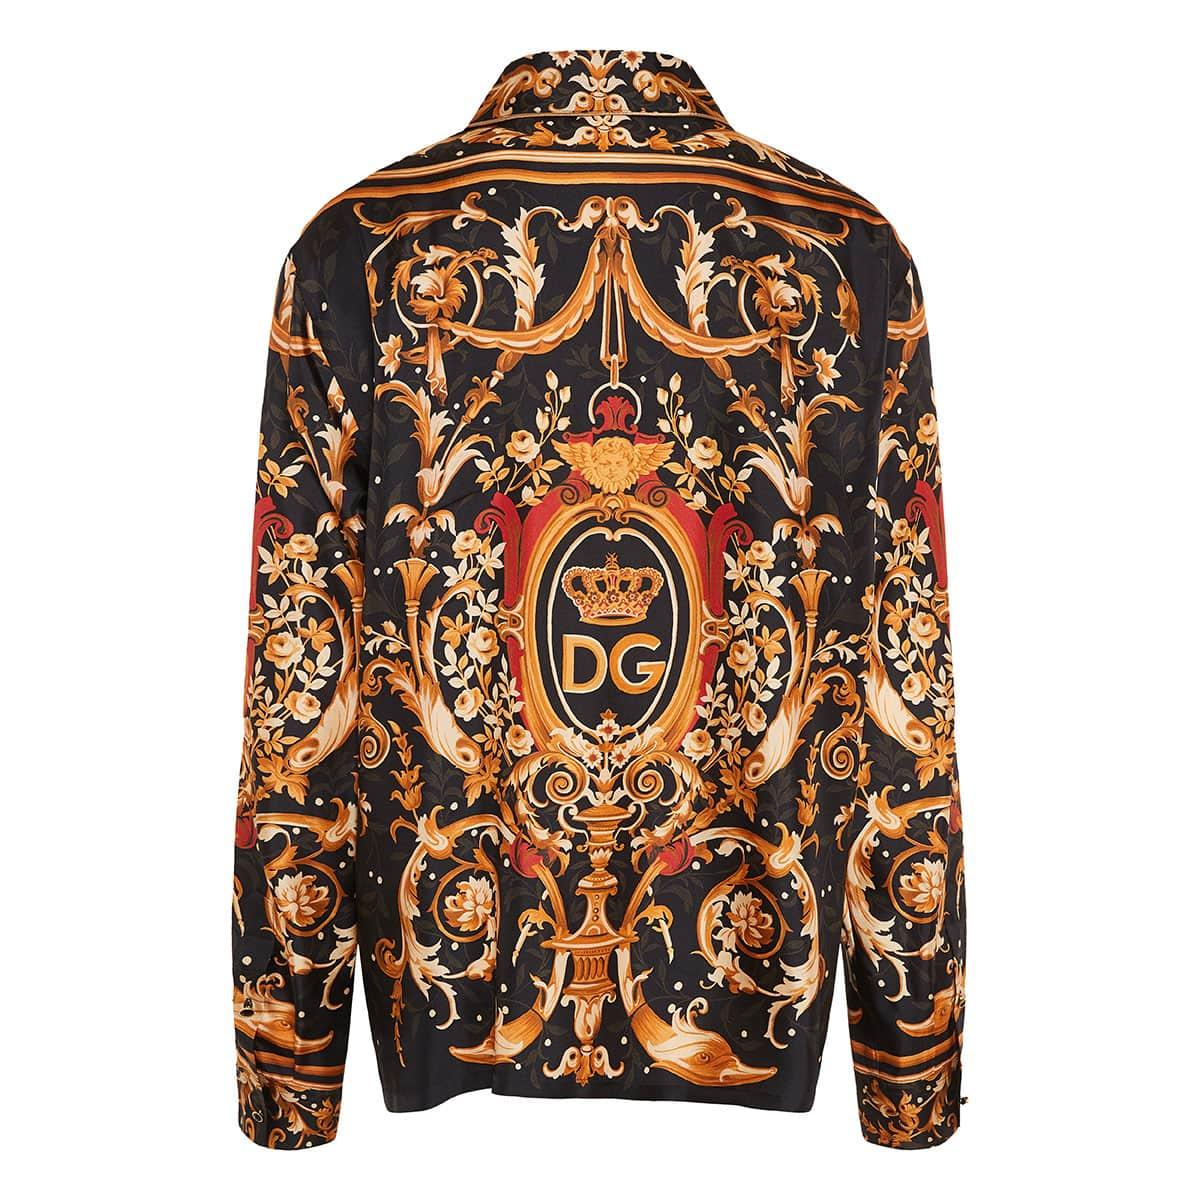 Baroque print silk pajama shirt